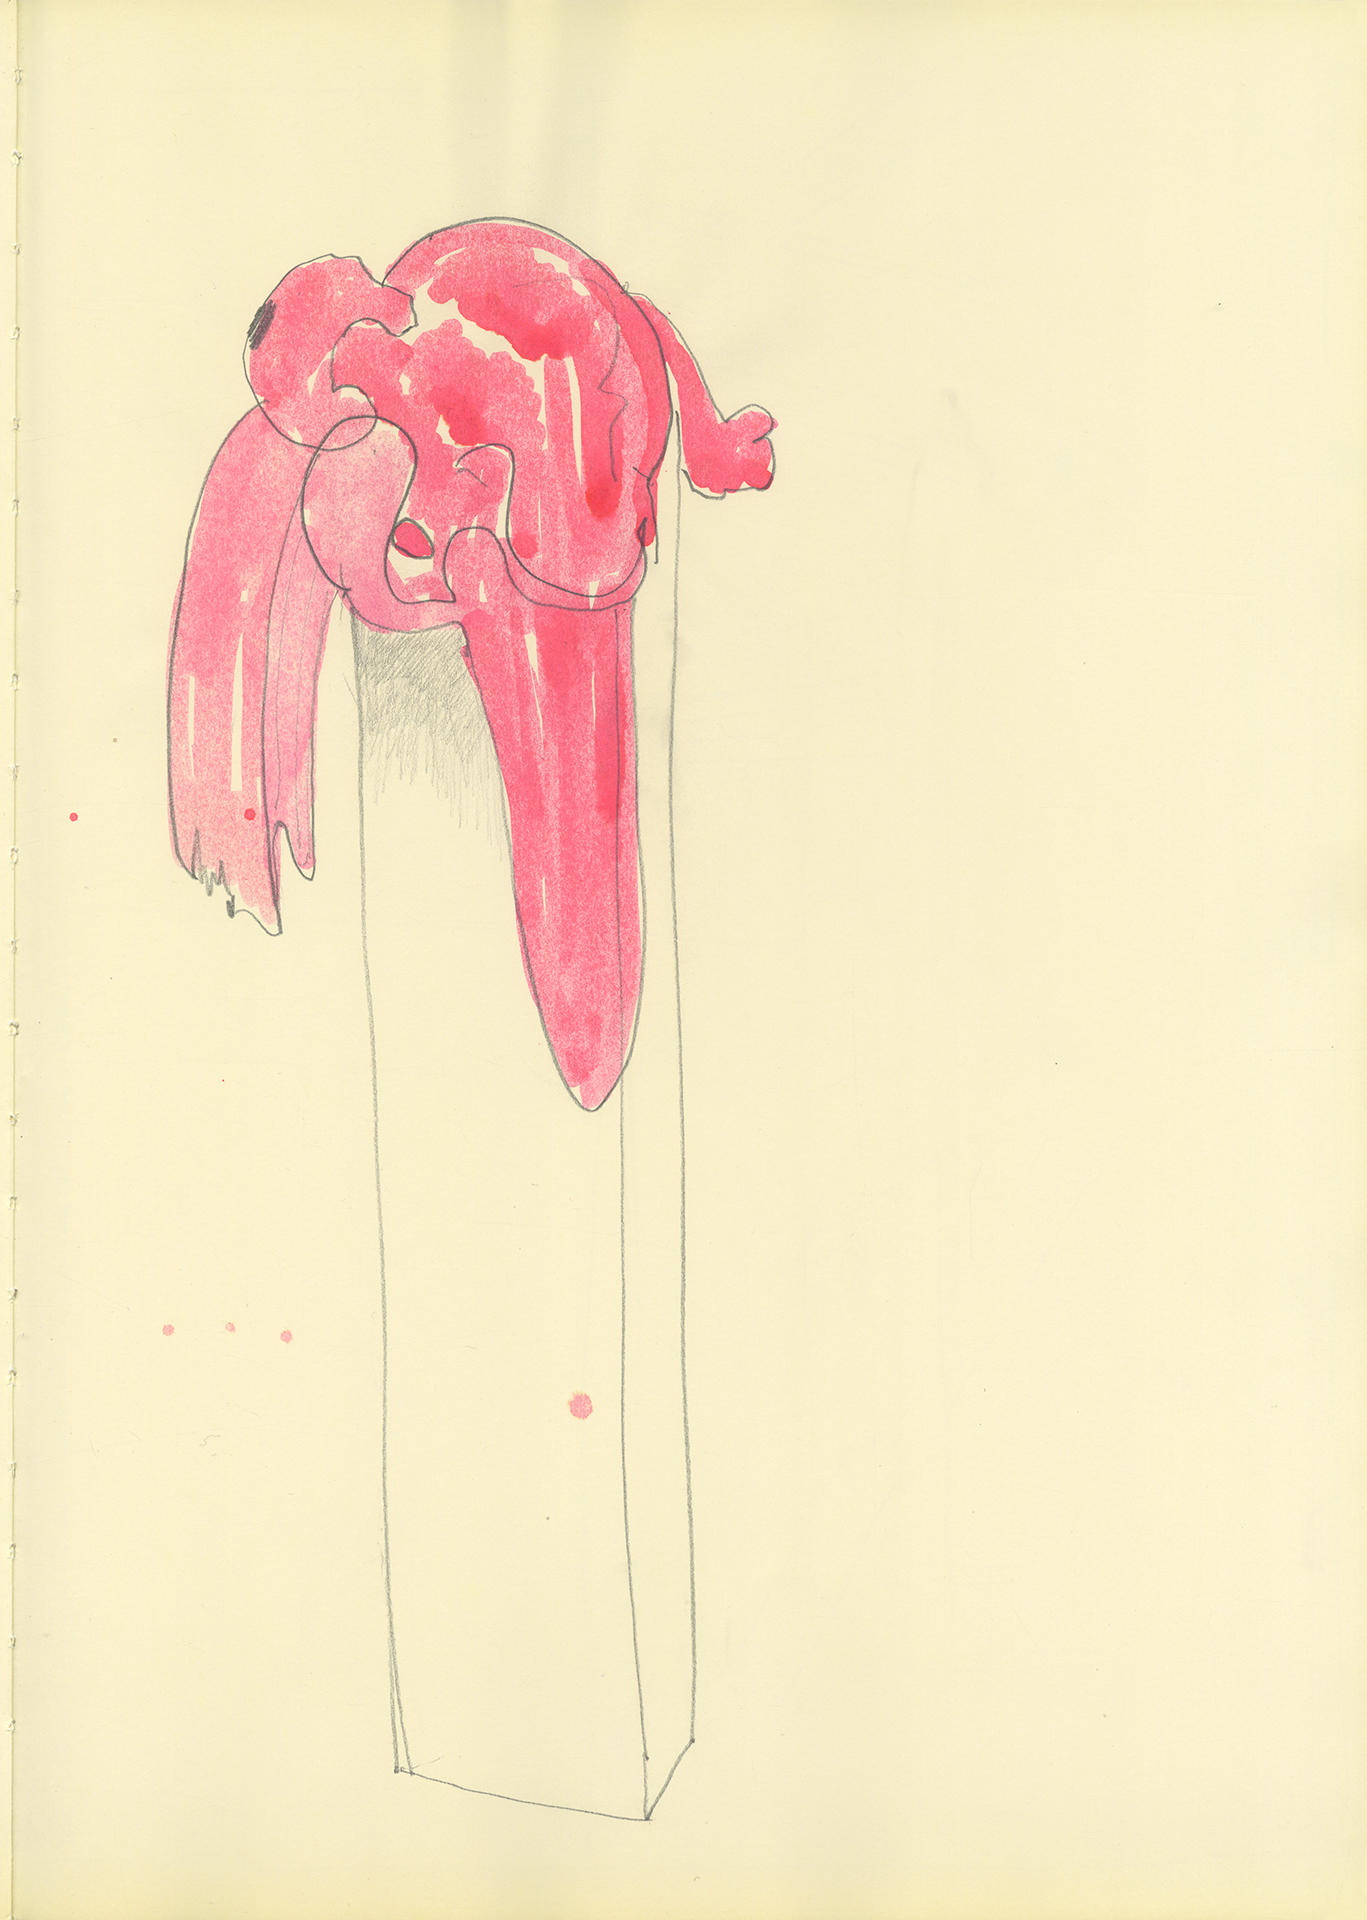 Bharti Kher, Untitled, 2013, mixed media on paper, 42cm x 30cm